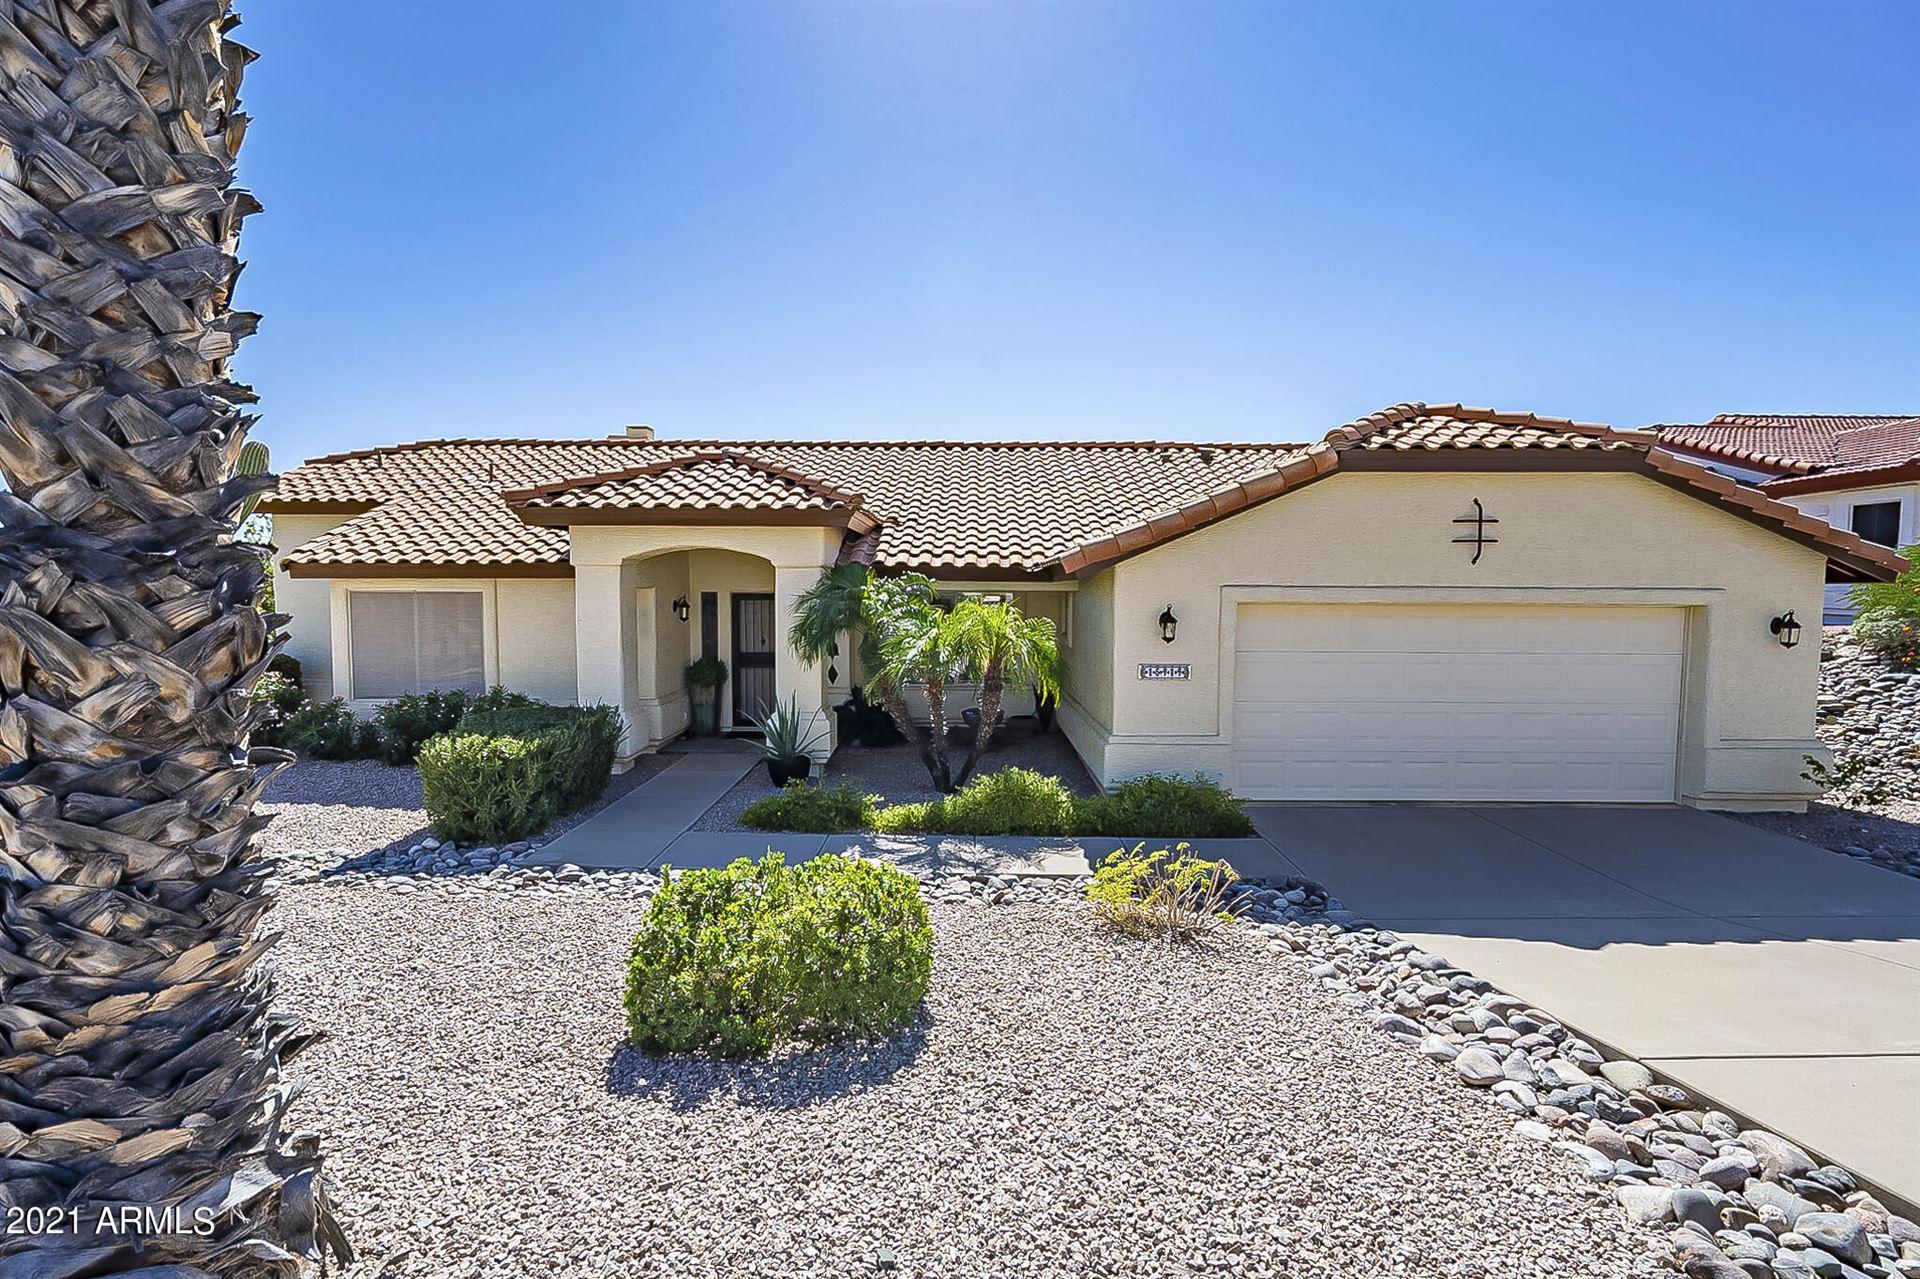 Photo of 15919 E BRODIEA Drive, Fountain Hills, AZ 85268 (MLS # 6306221)